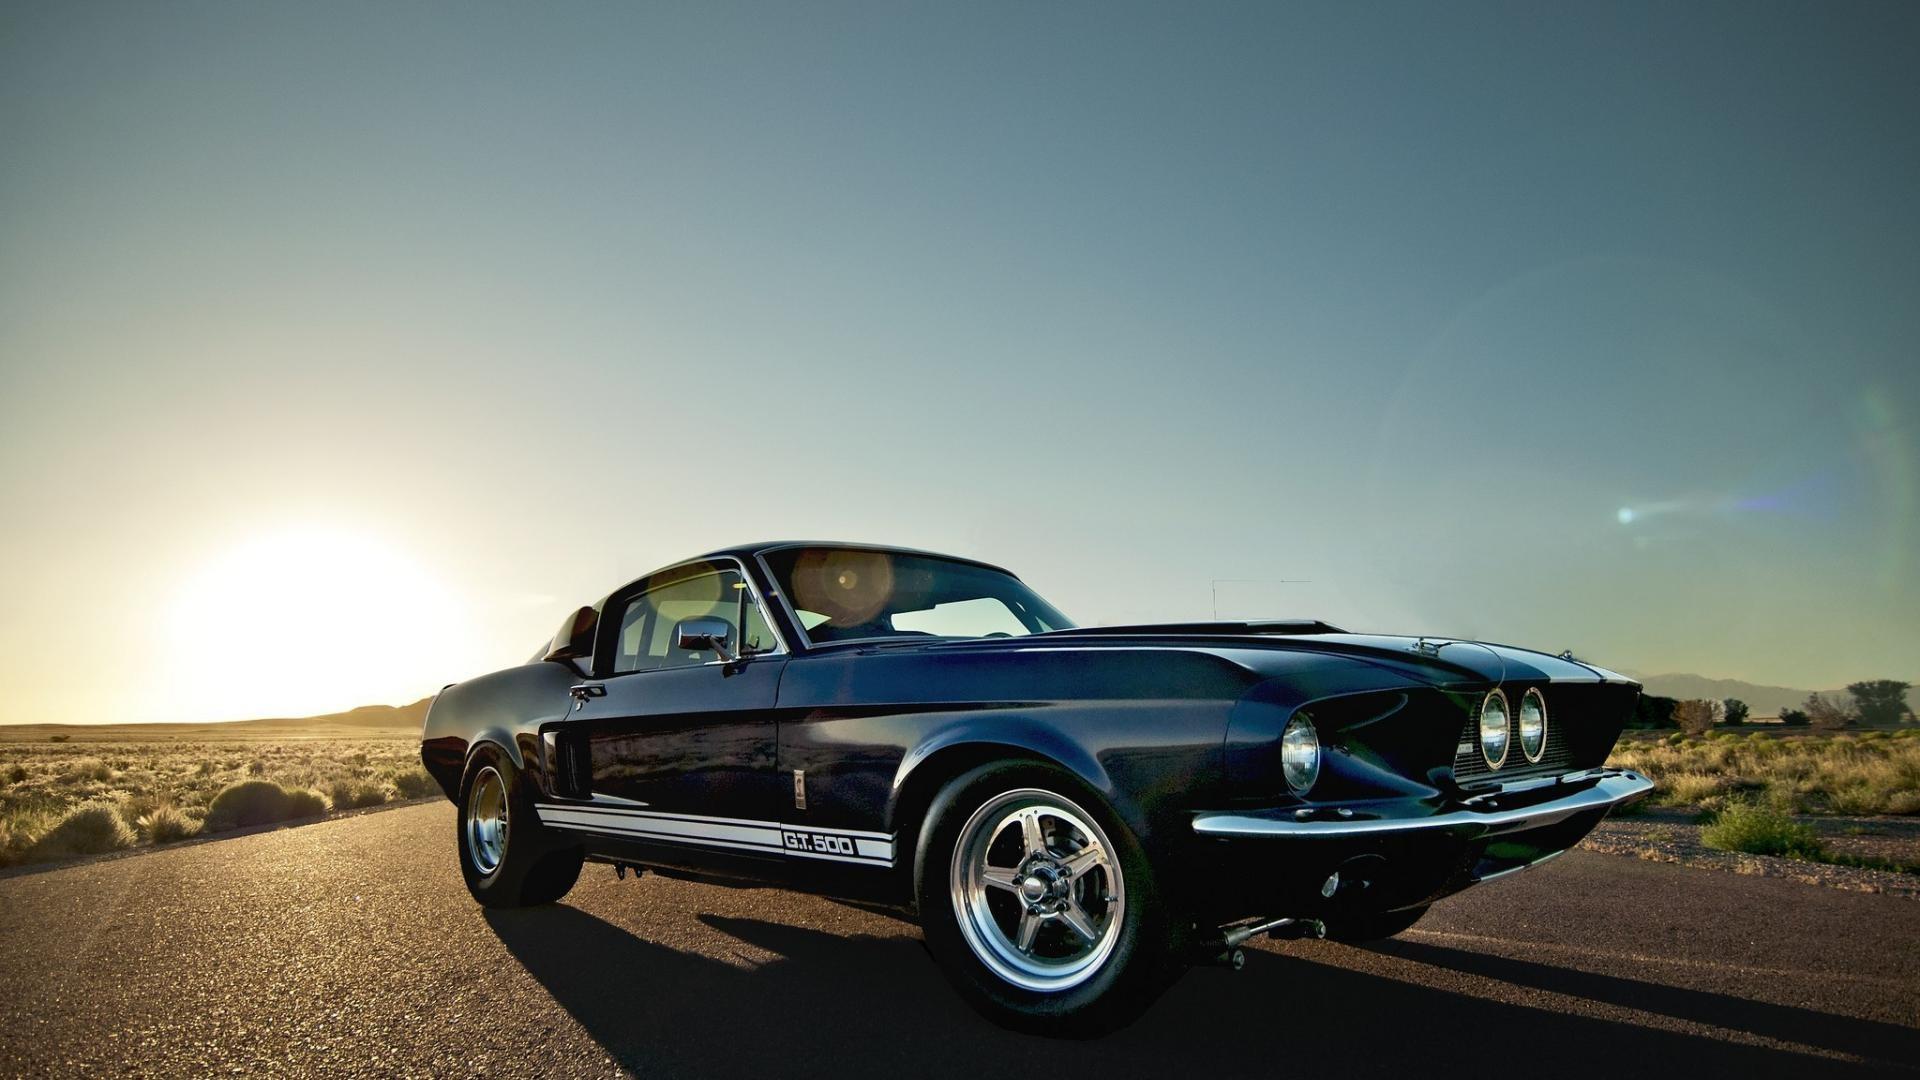 Classic Mustang Wallpaper